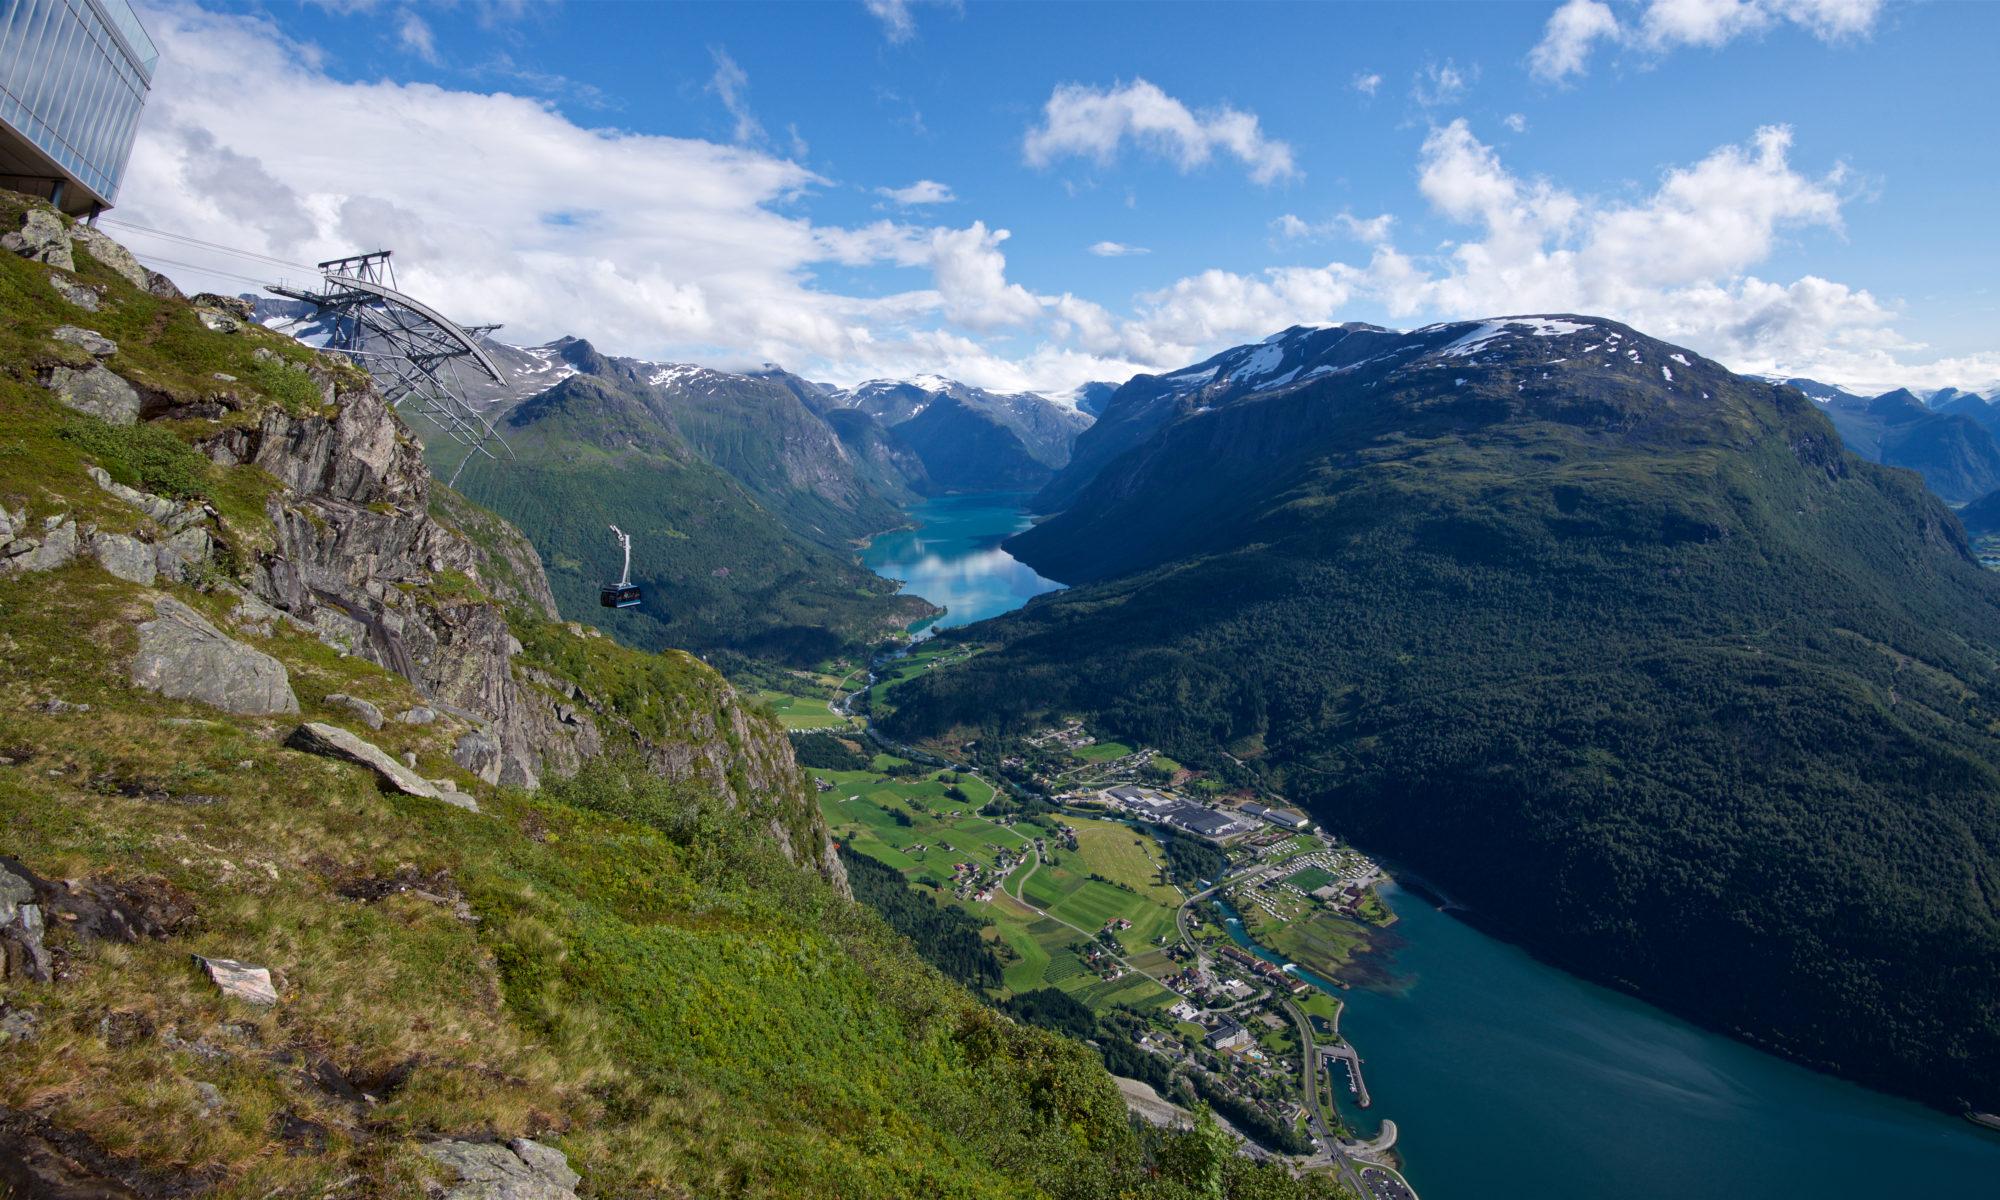 Loen Skylift in Nordfjord